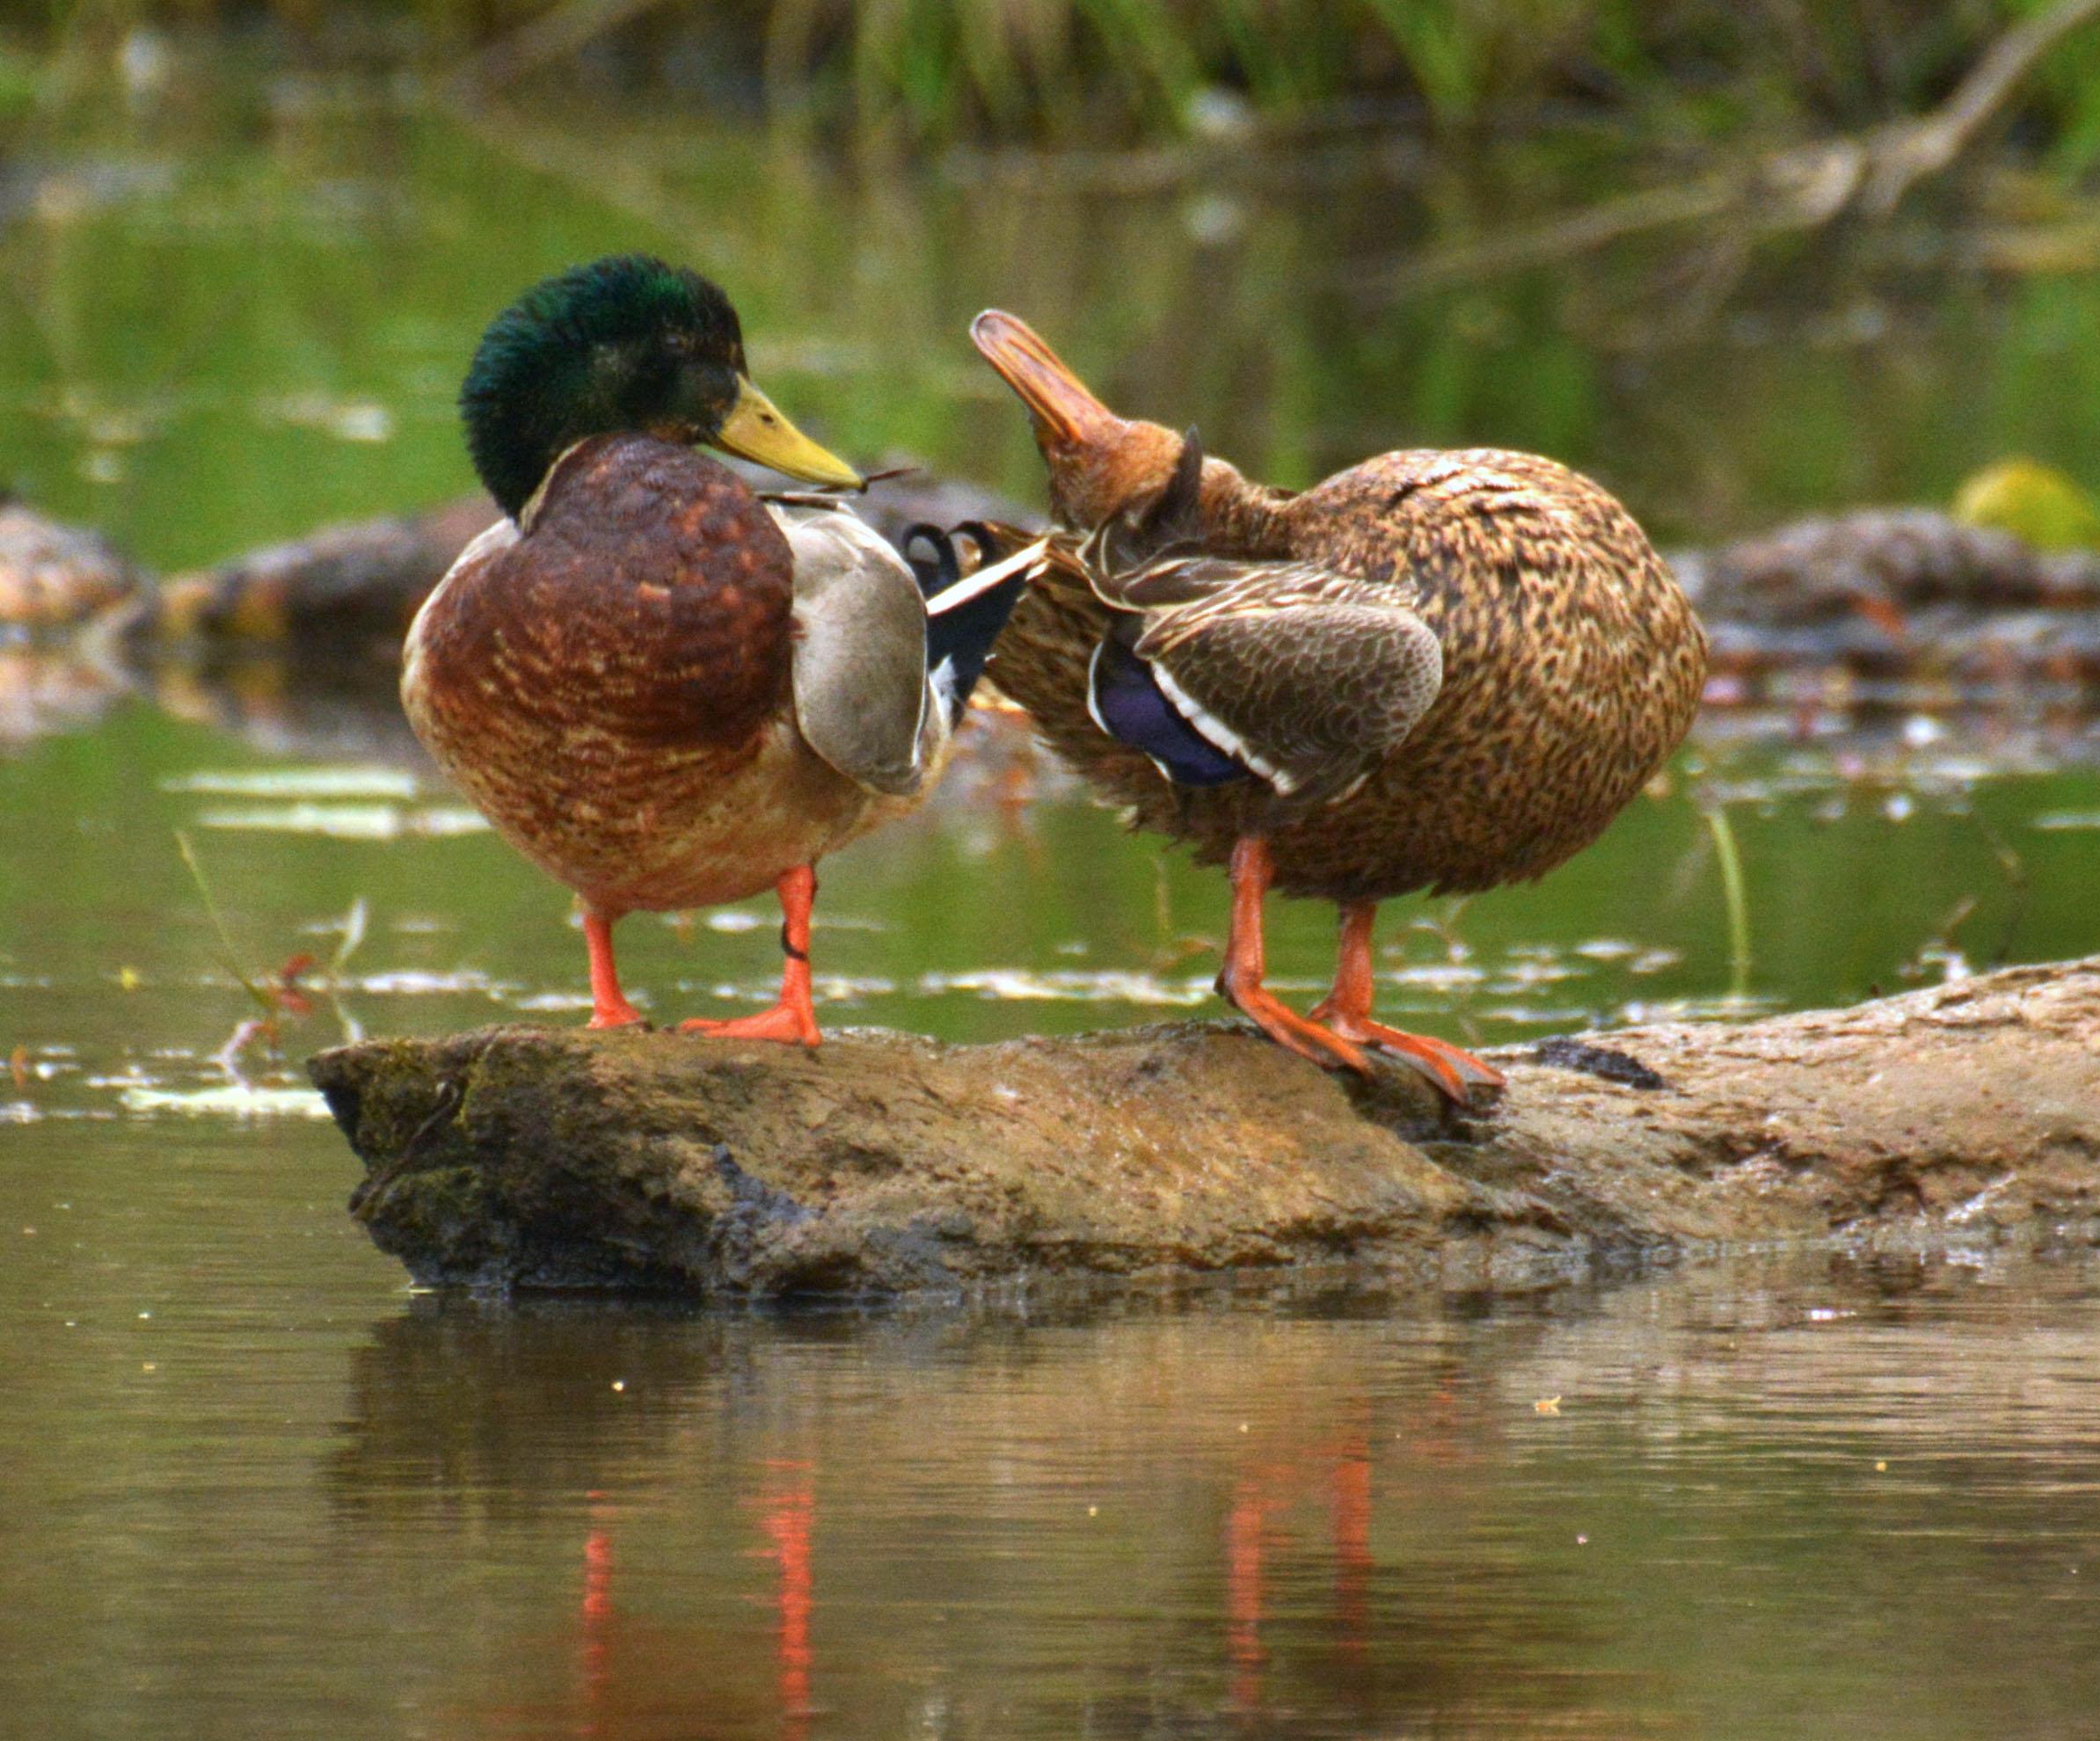 Photo by Jim Peppler - Esopus Bend Nature Preserve